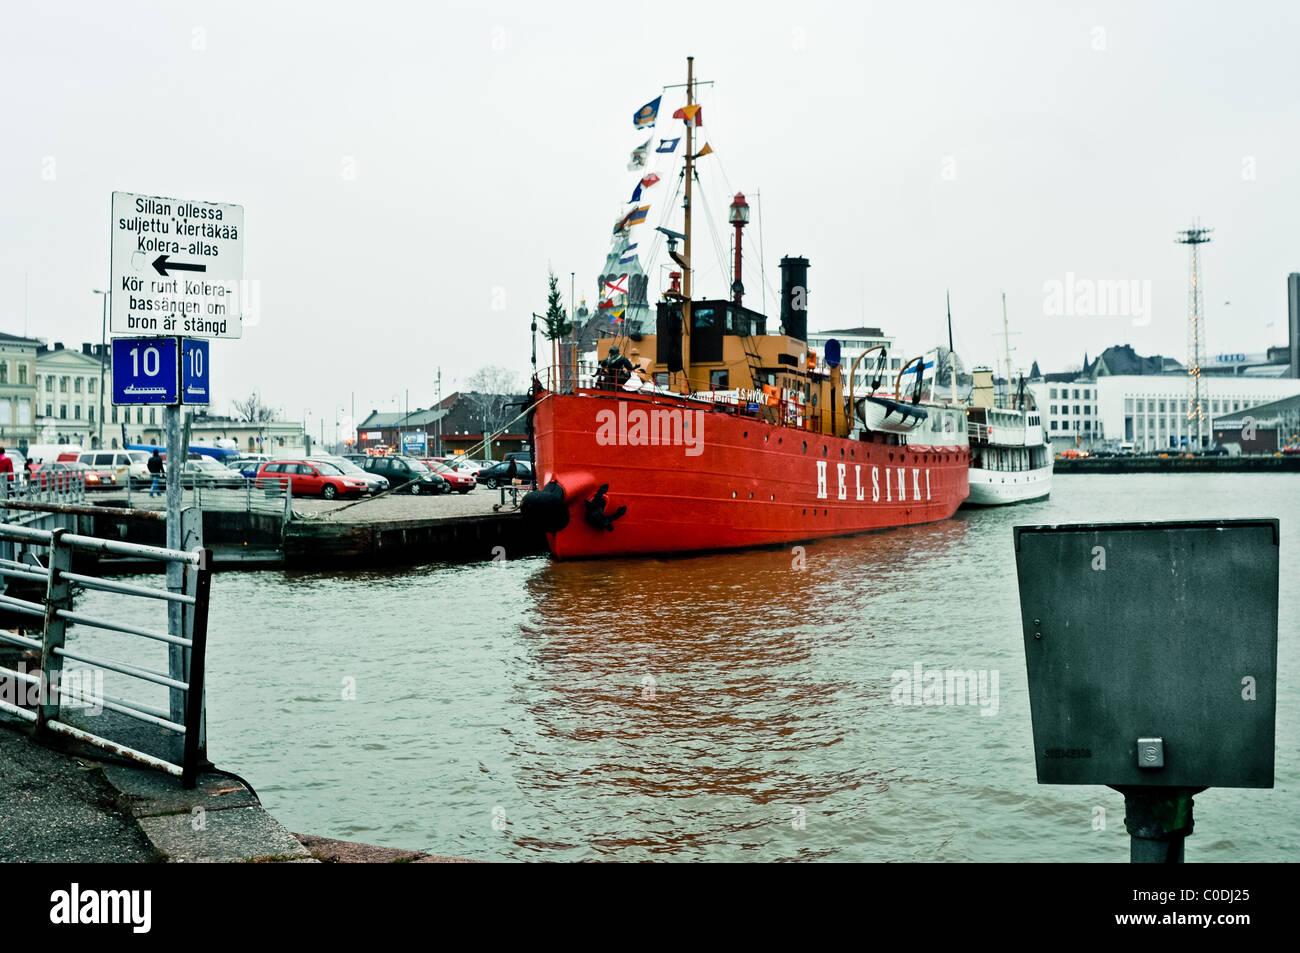 Hafer verankert im Hafen, täglichen Lebens Helsinki, Finnland Stockbild